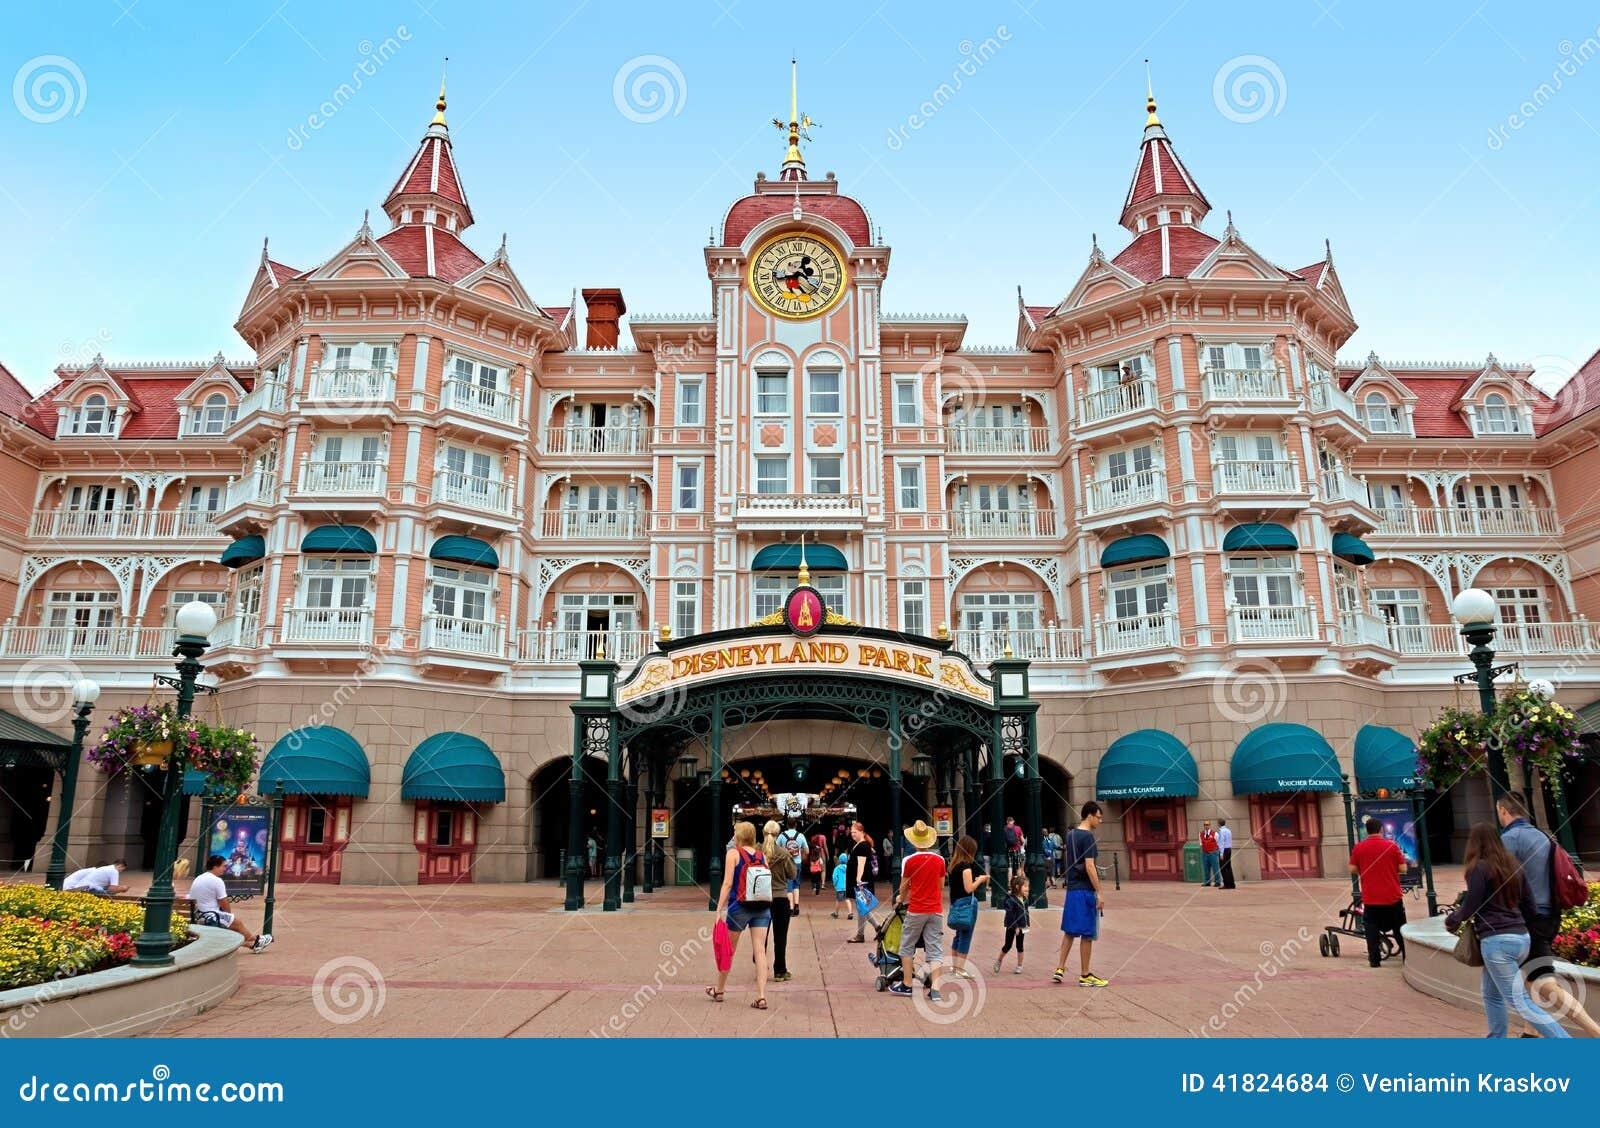 Disneylândia - entrada principal ao parque